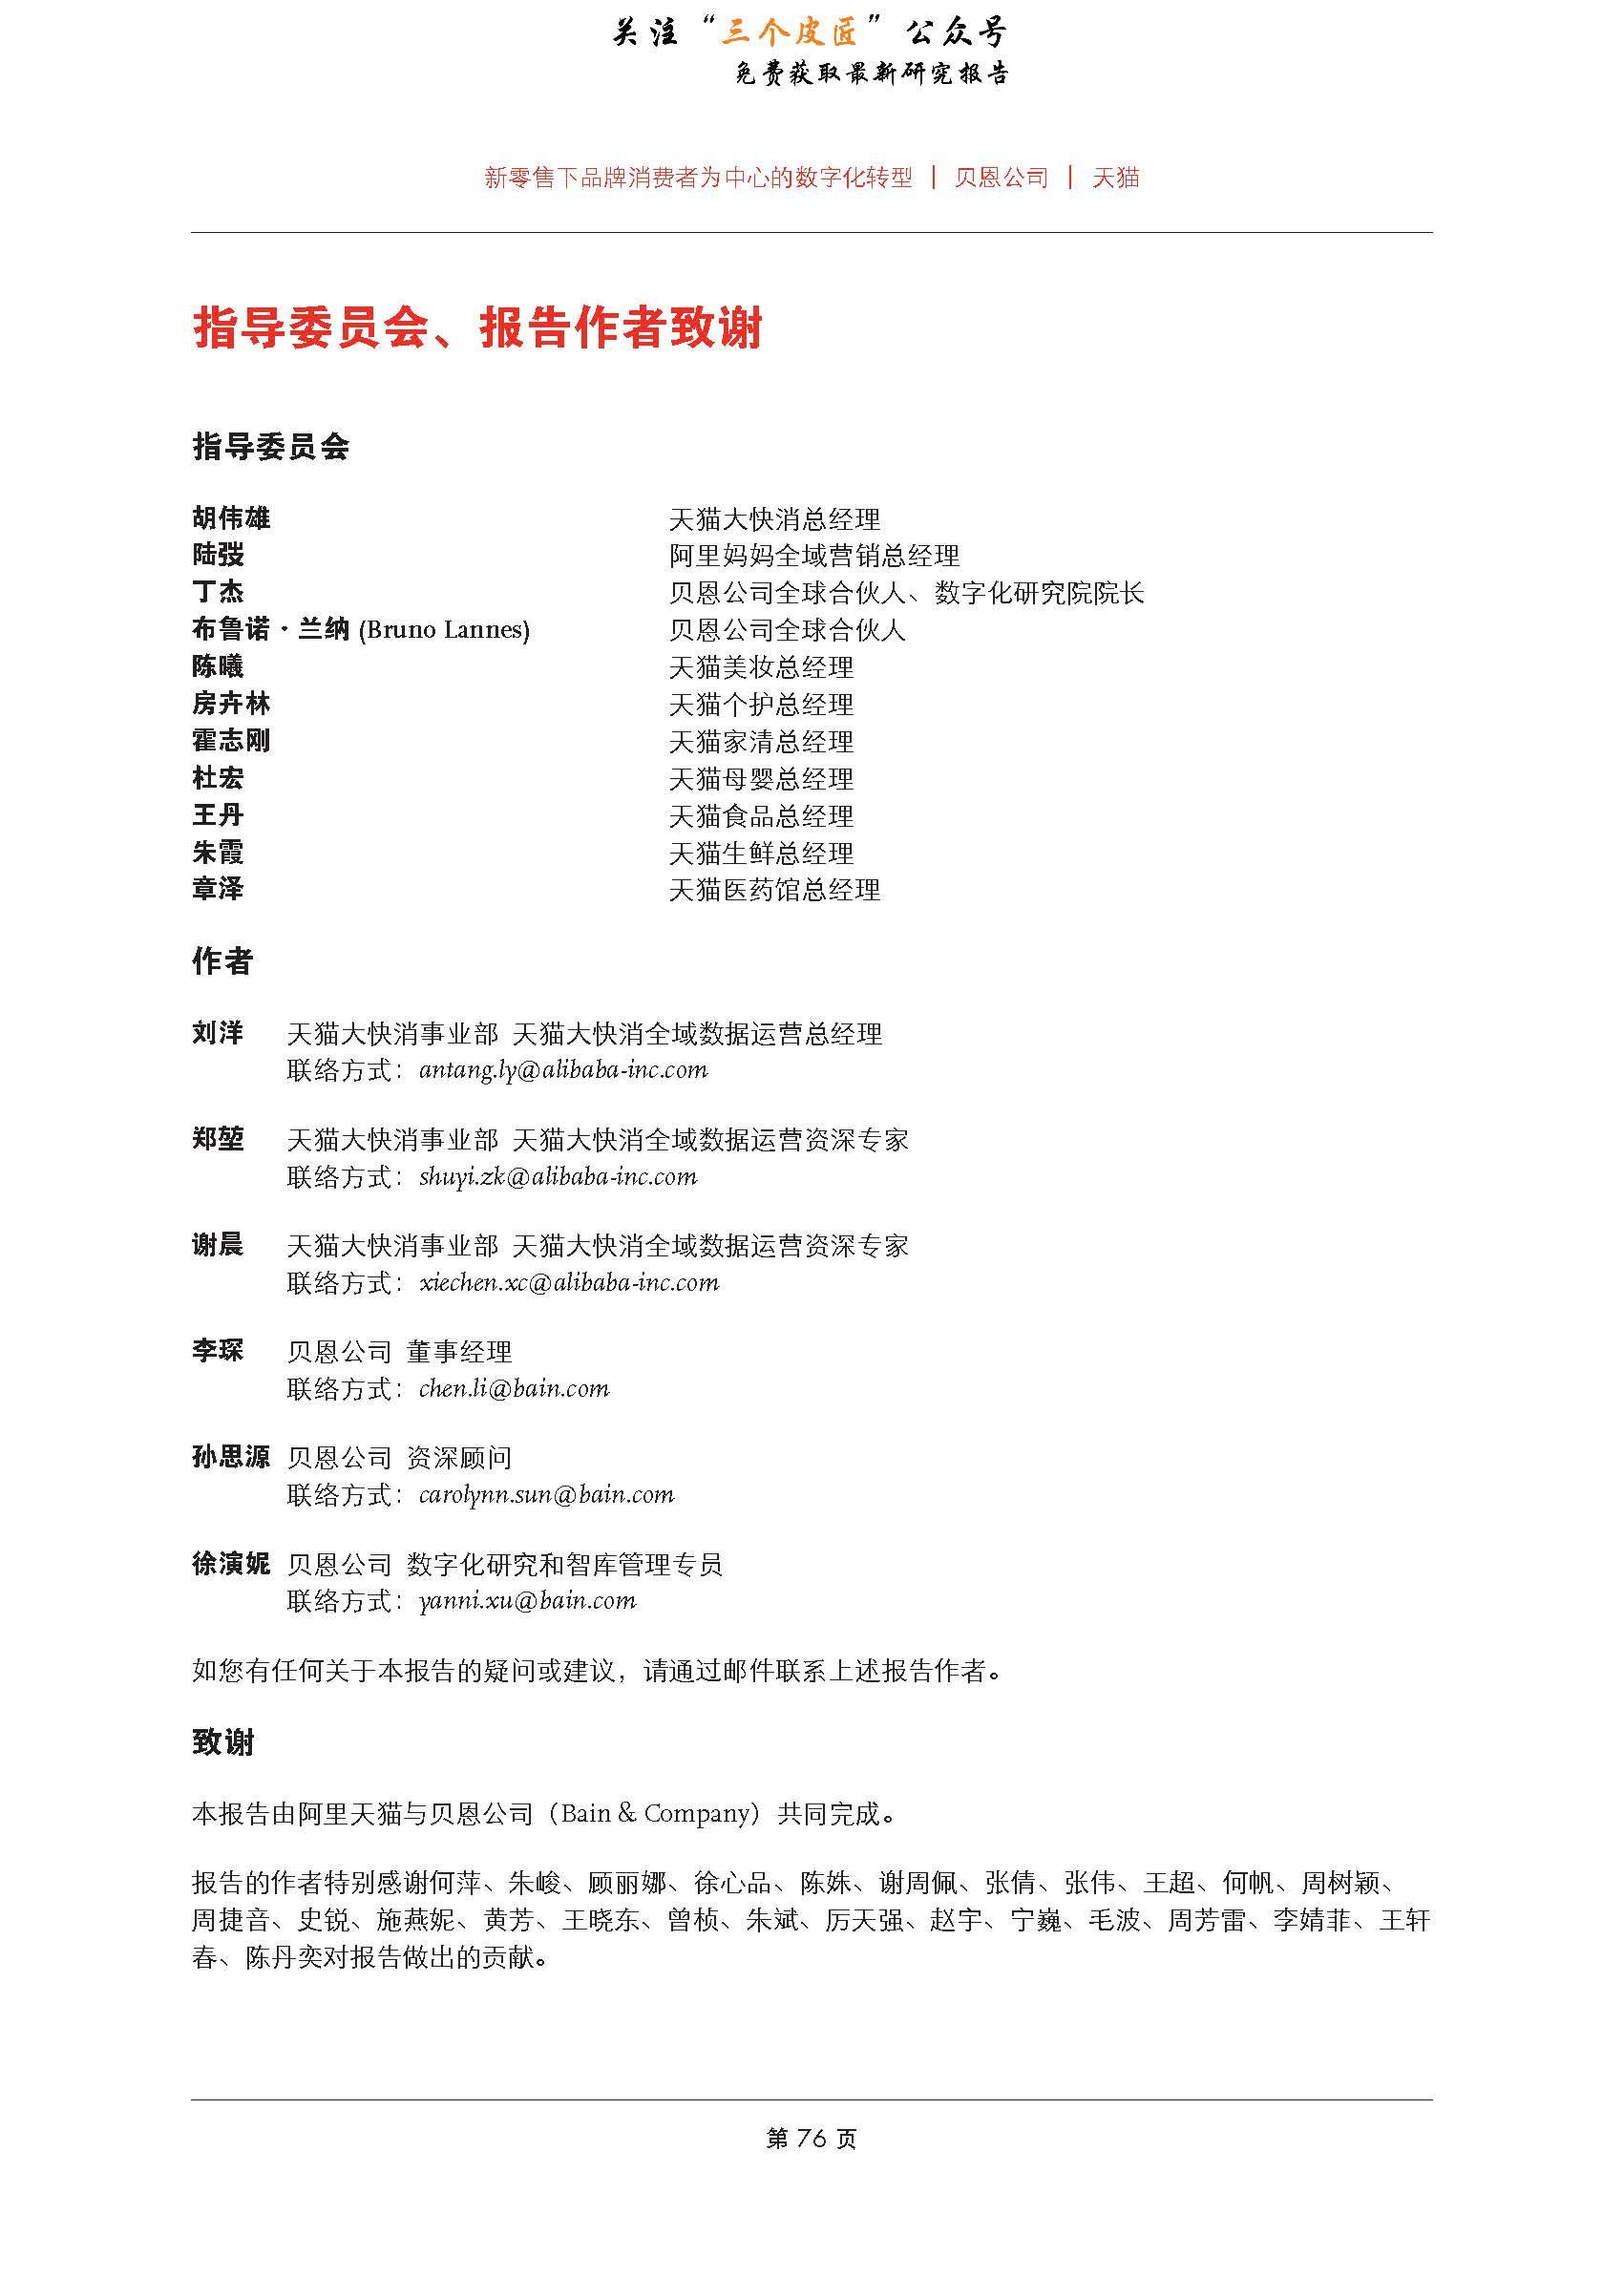 1_Page_78.jpg